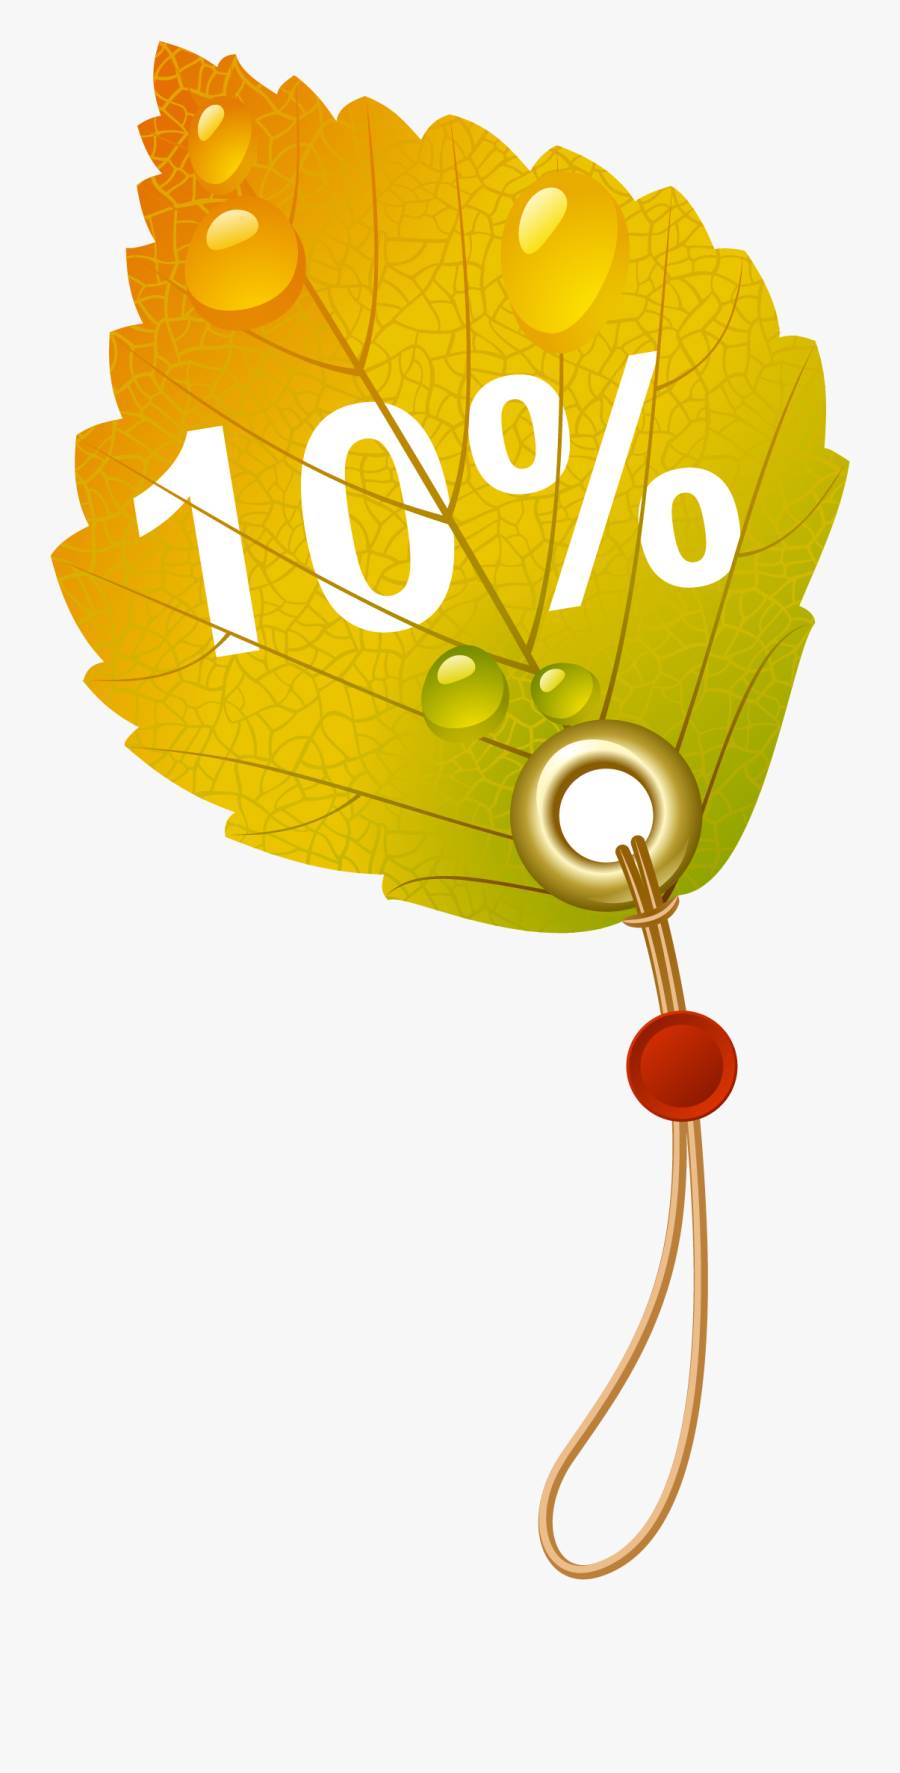 Autumn Leaves Vector, Transparent Clipart